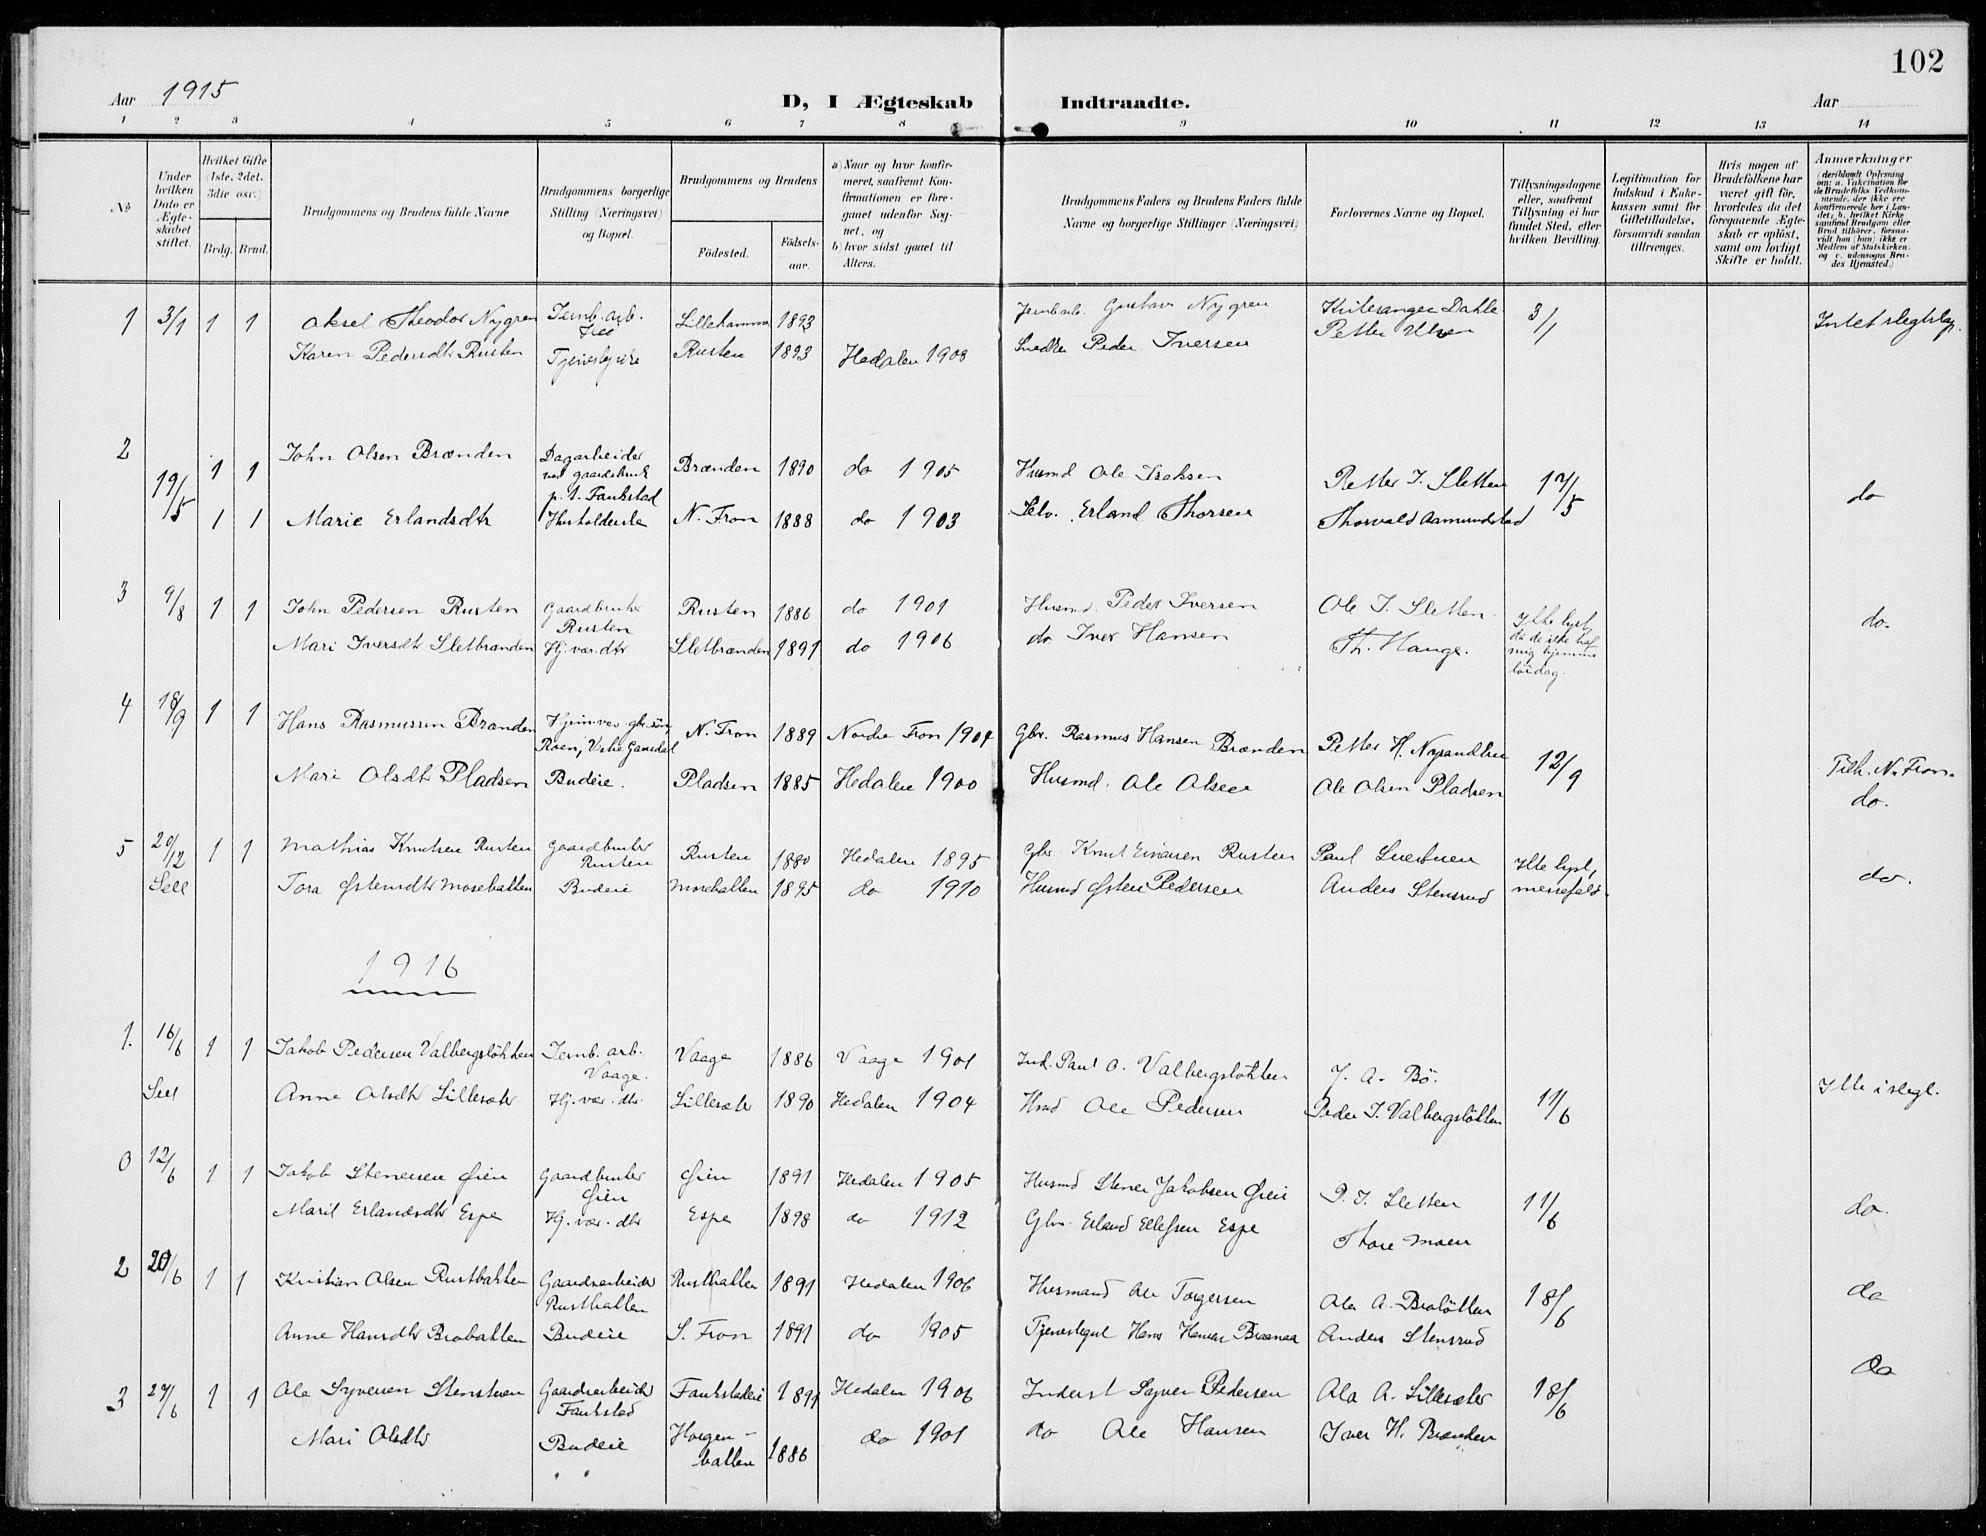 SAH, Sel prestekontor, Ministerialbok nr. 1, 1905-1922, s. 102